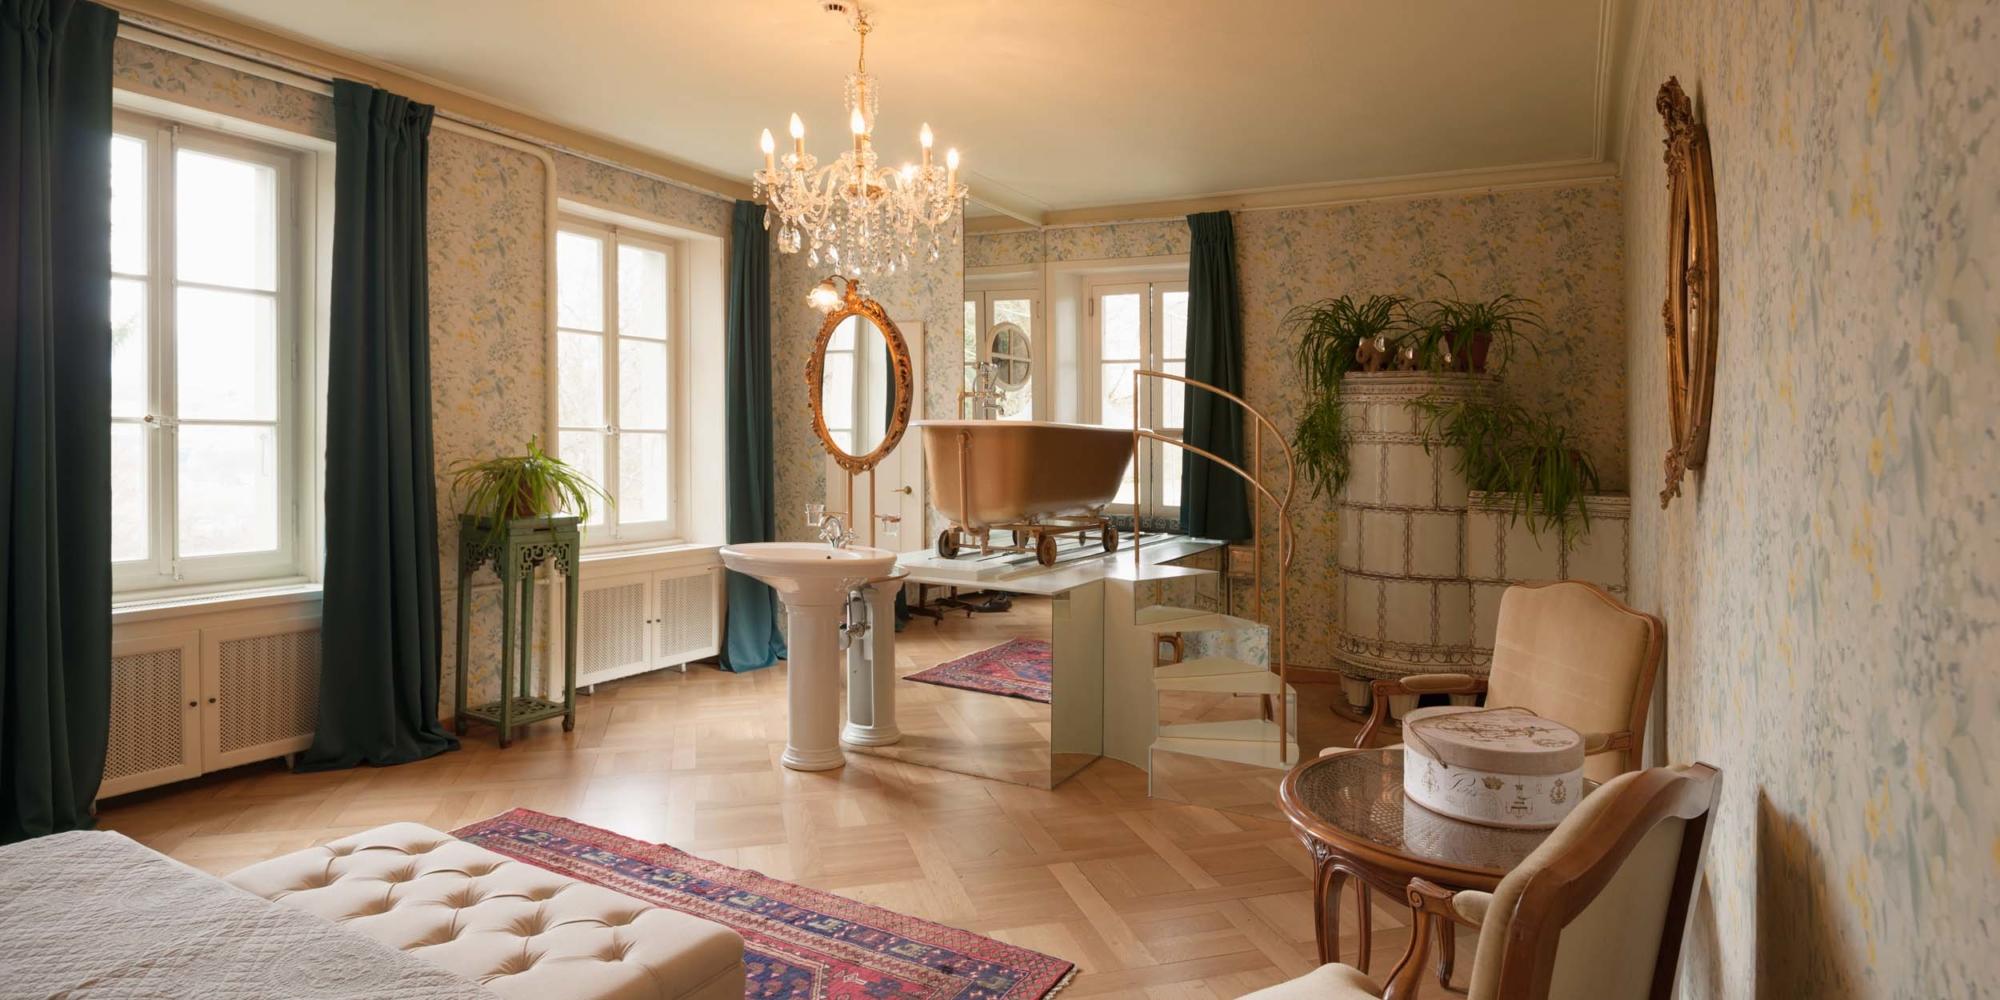 Auberge Aux 4 Vents - Chambre Cupidon - 2017 Olivier Savoy